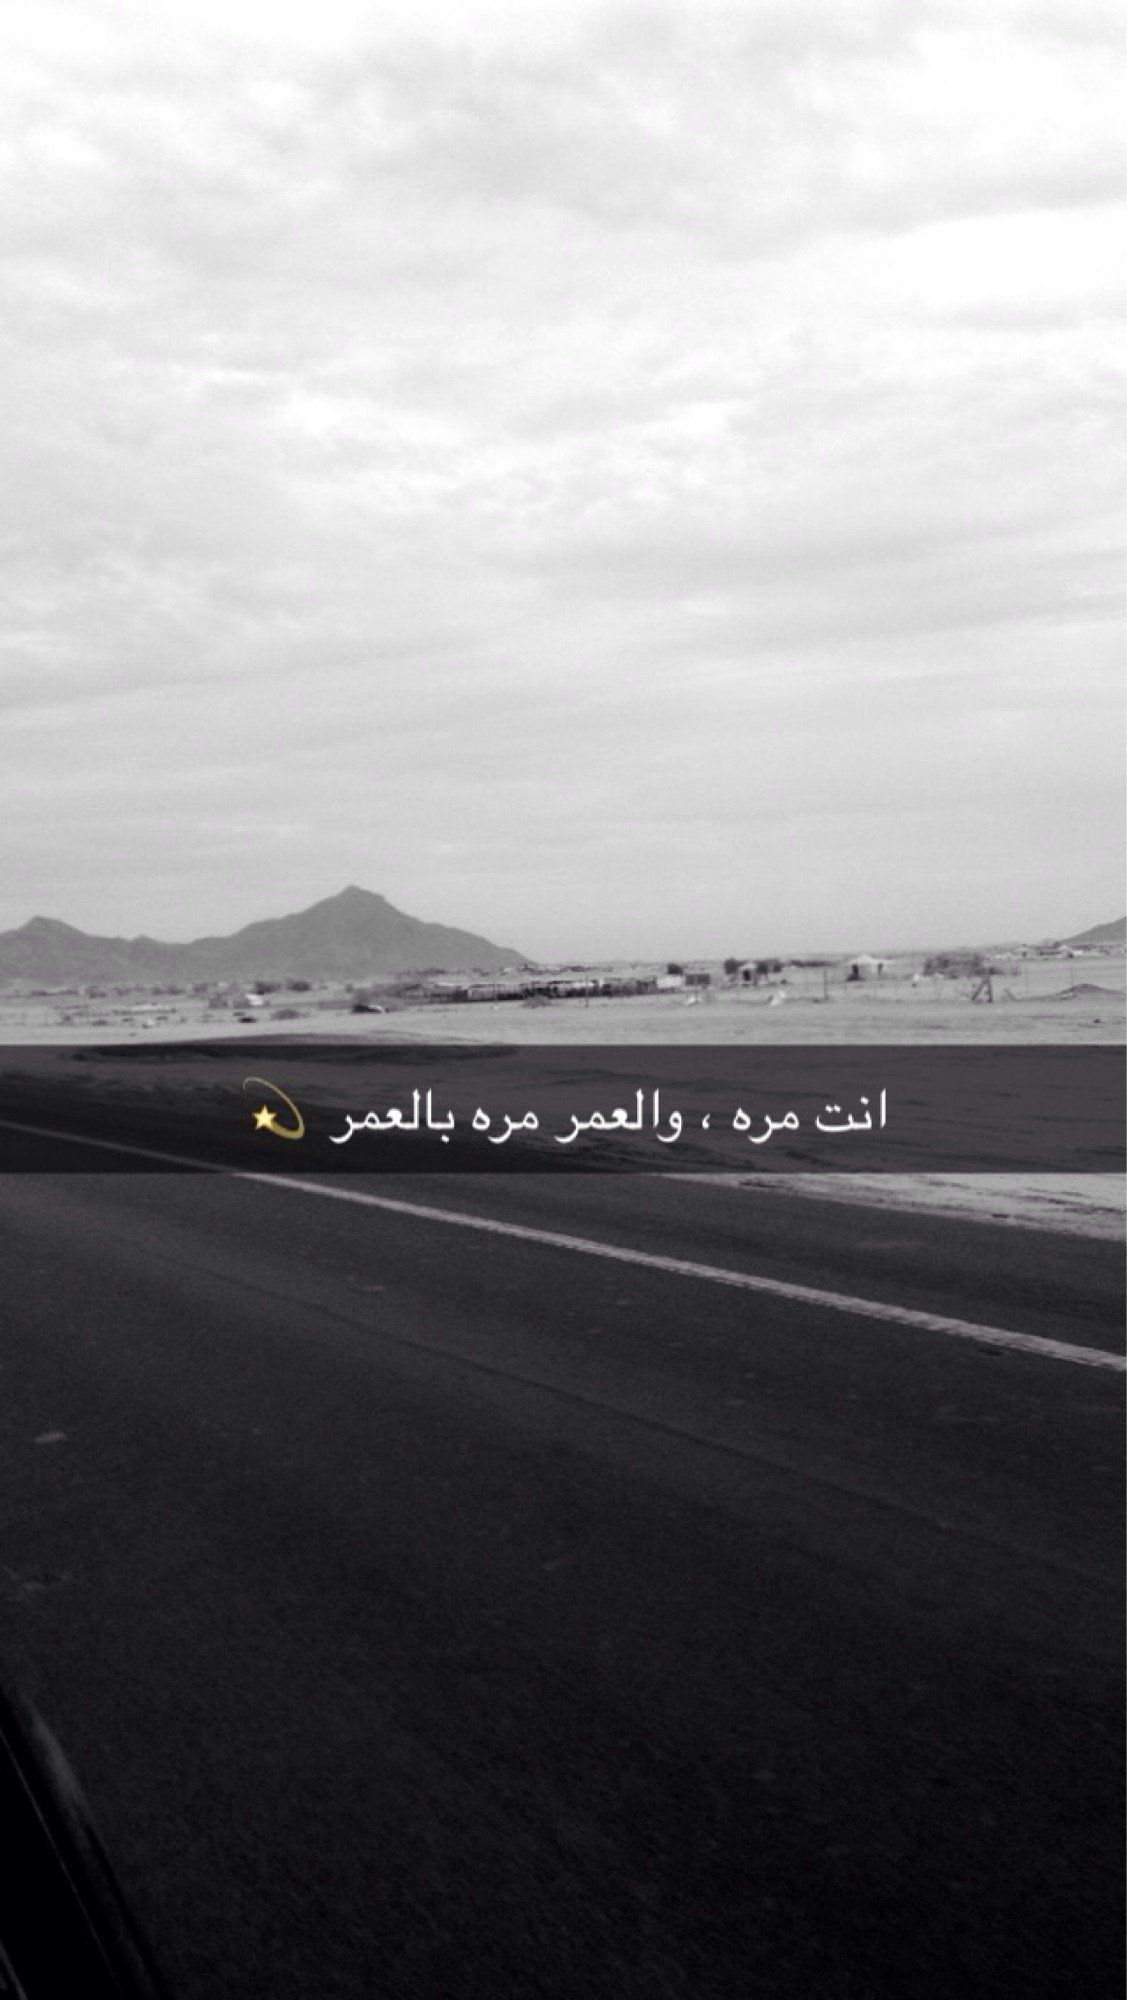 az0o0o0's Cover Photo